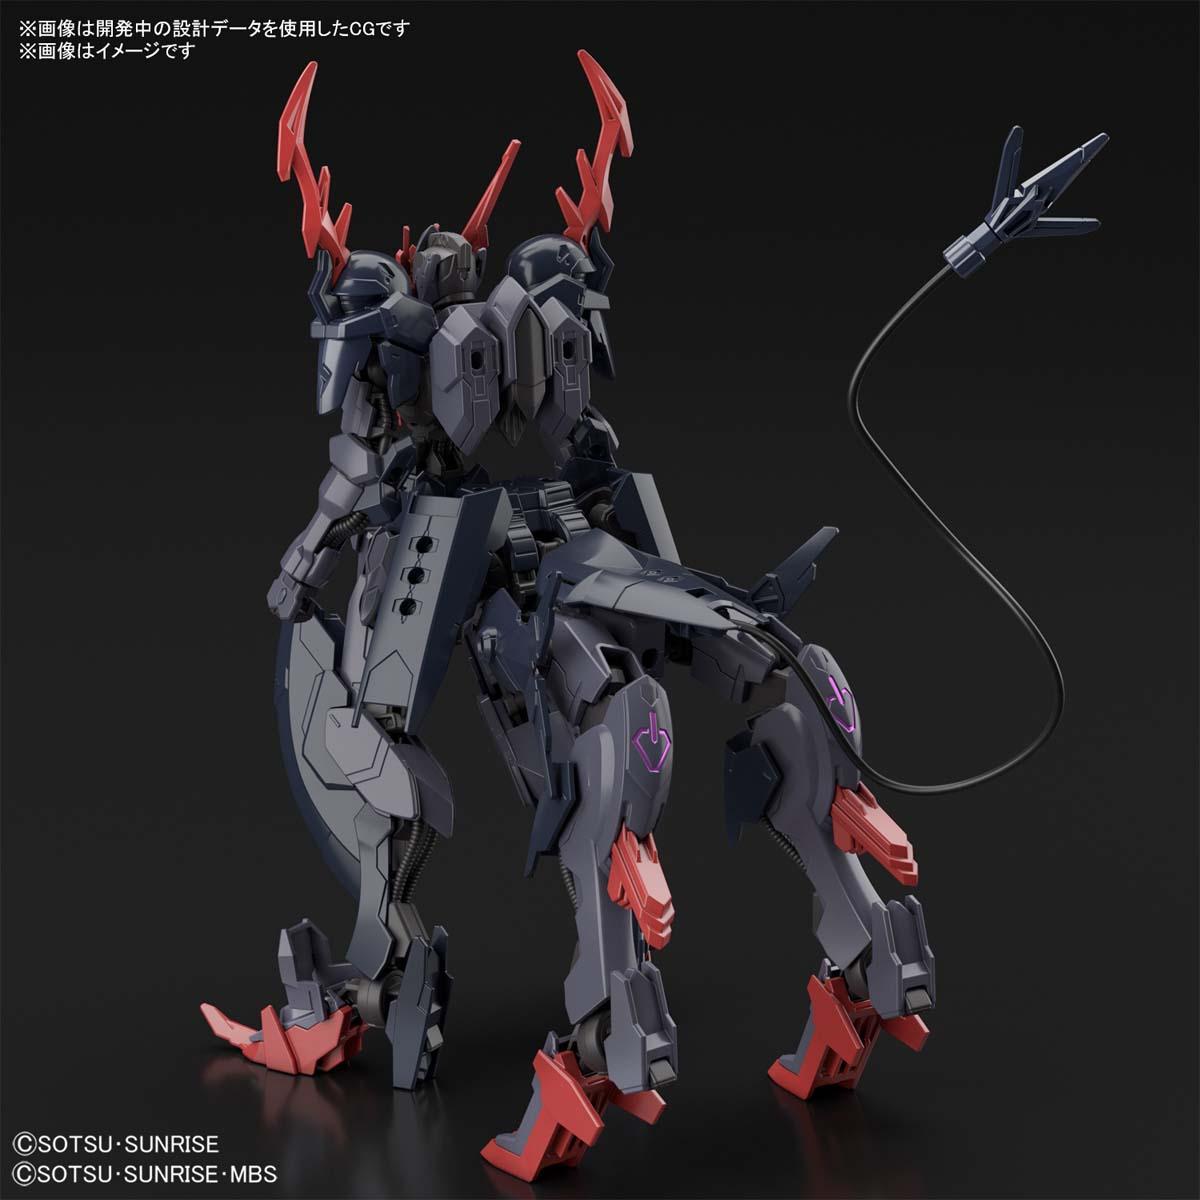 HG 1/144『ガンダムバルバタウロス』ガンダムブレイカー バトローグ プラモデル-002